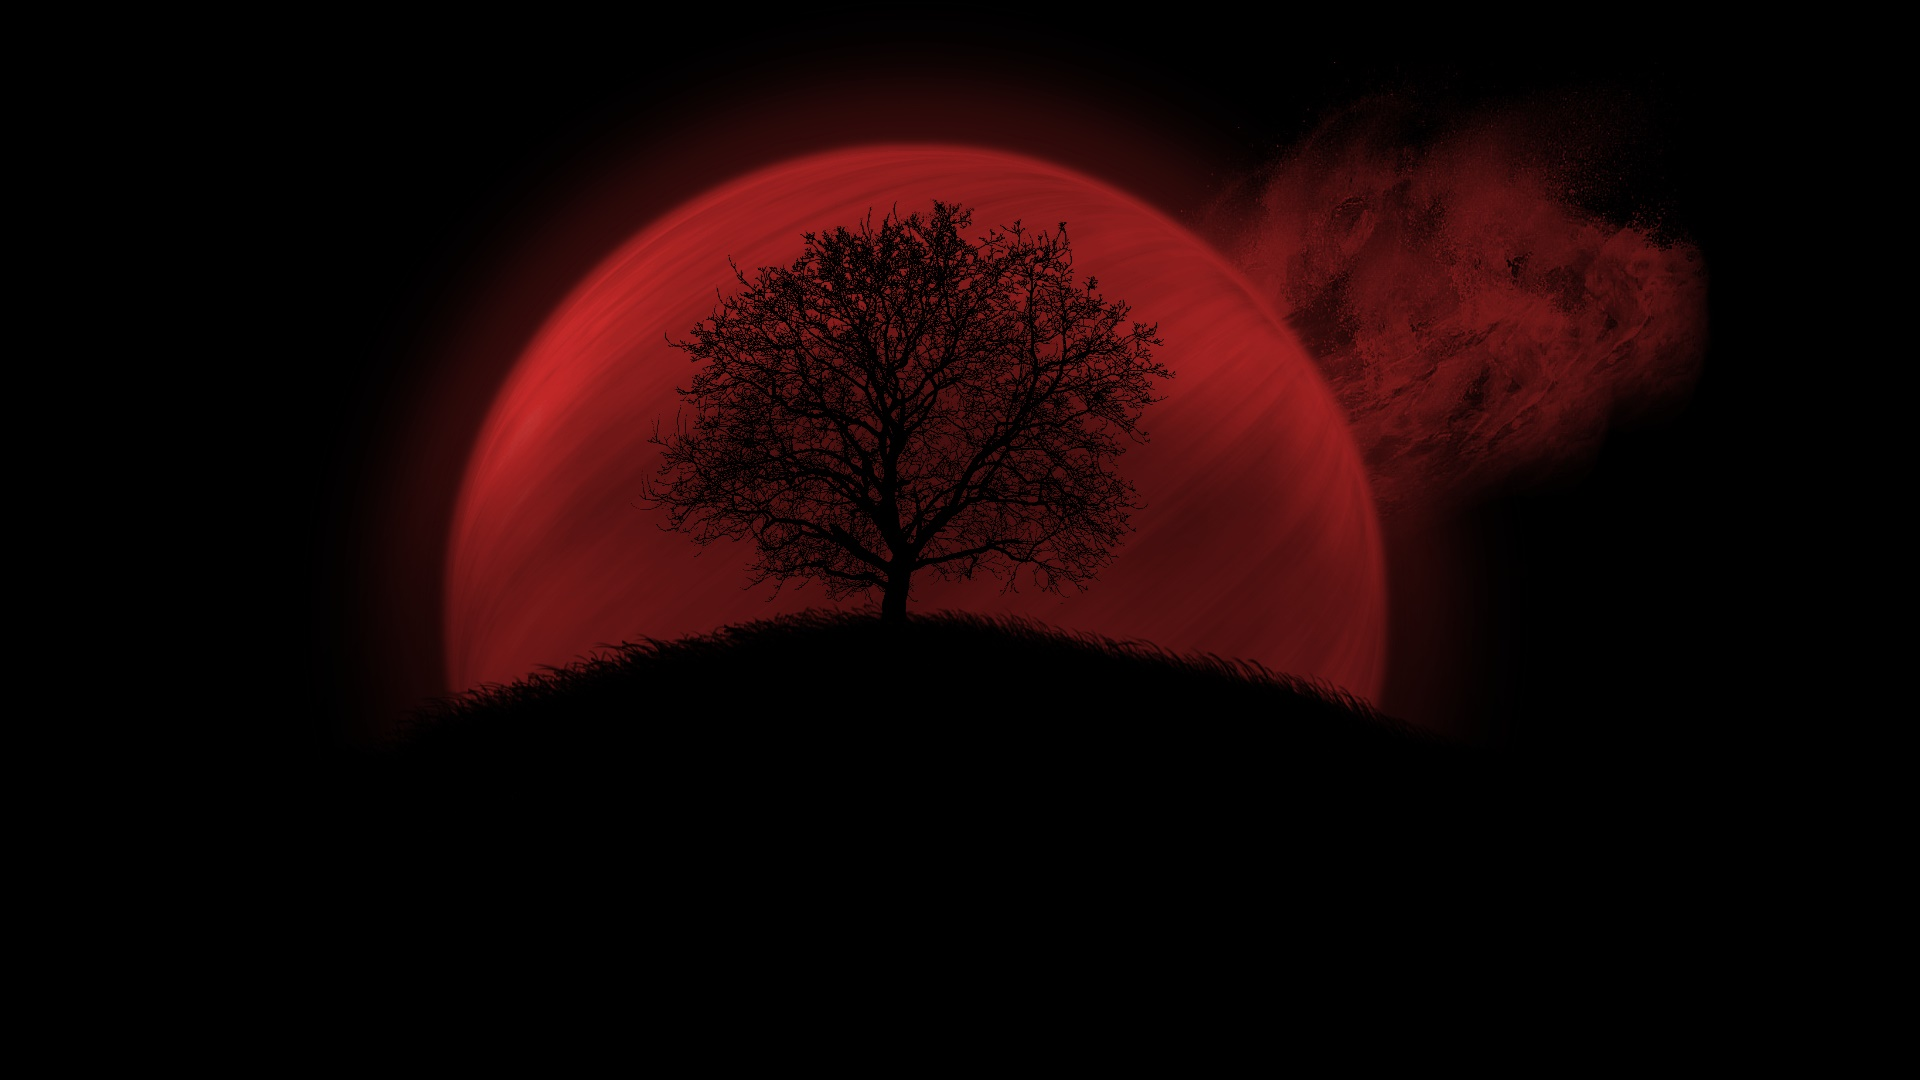 Red Full Moon Wallpaper Red Moon Full HD Wallp...